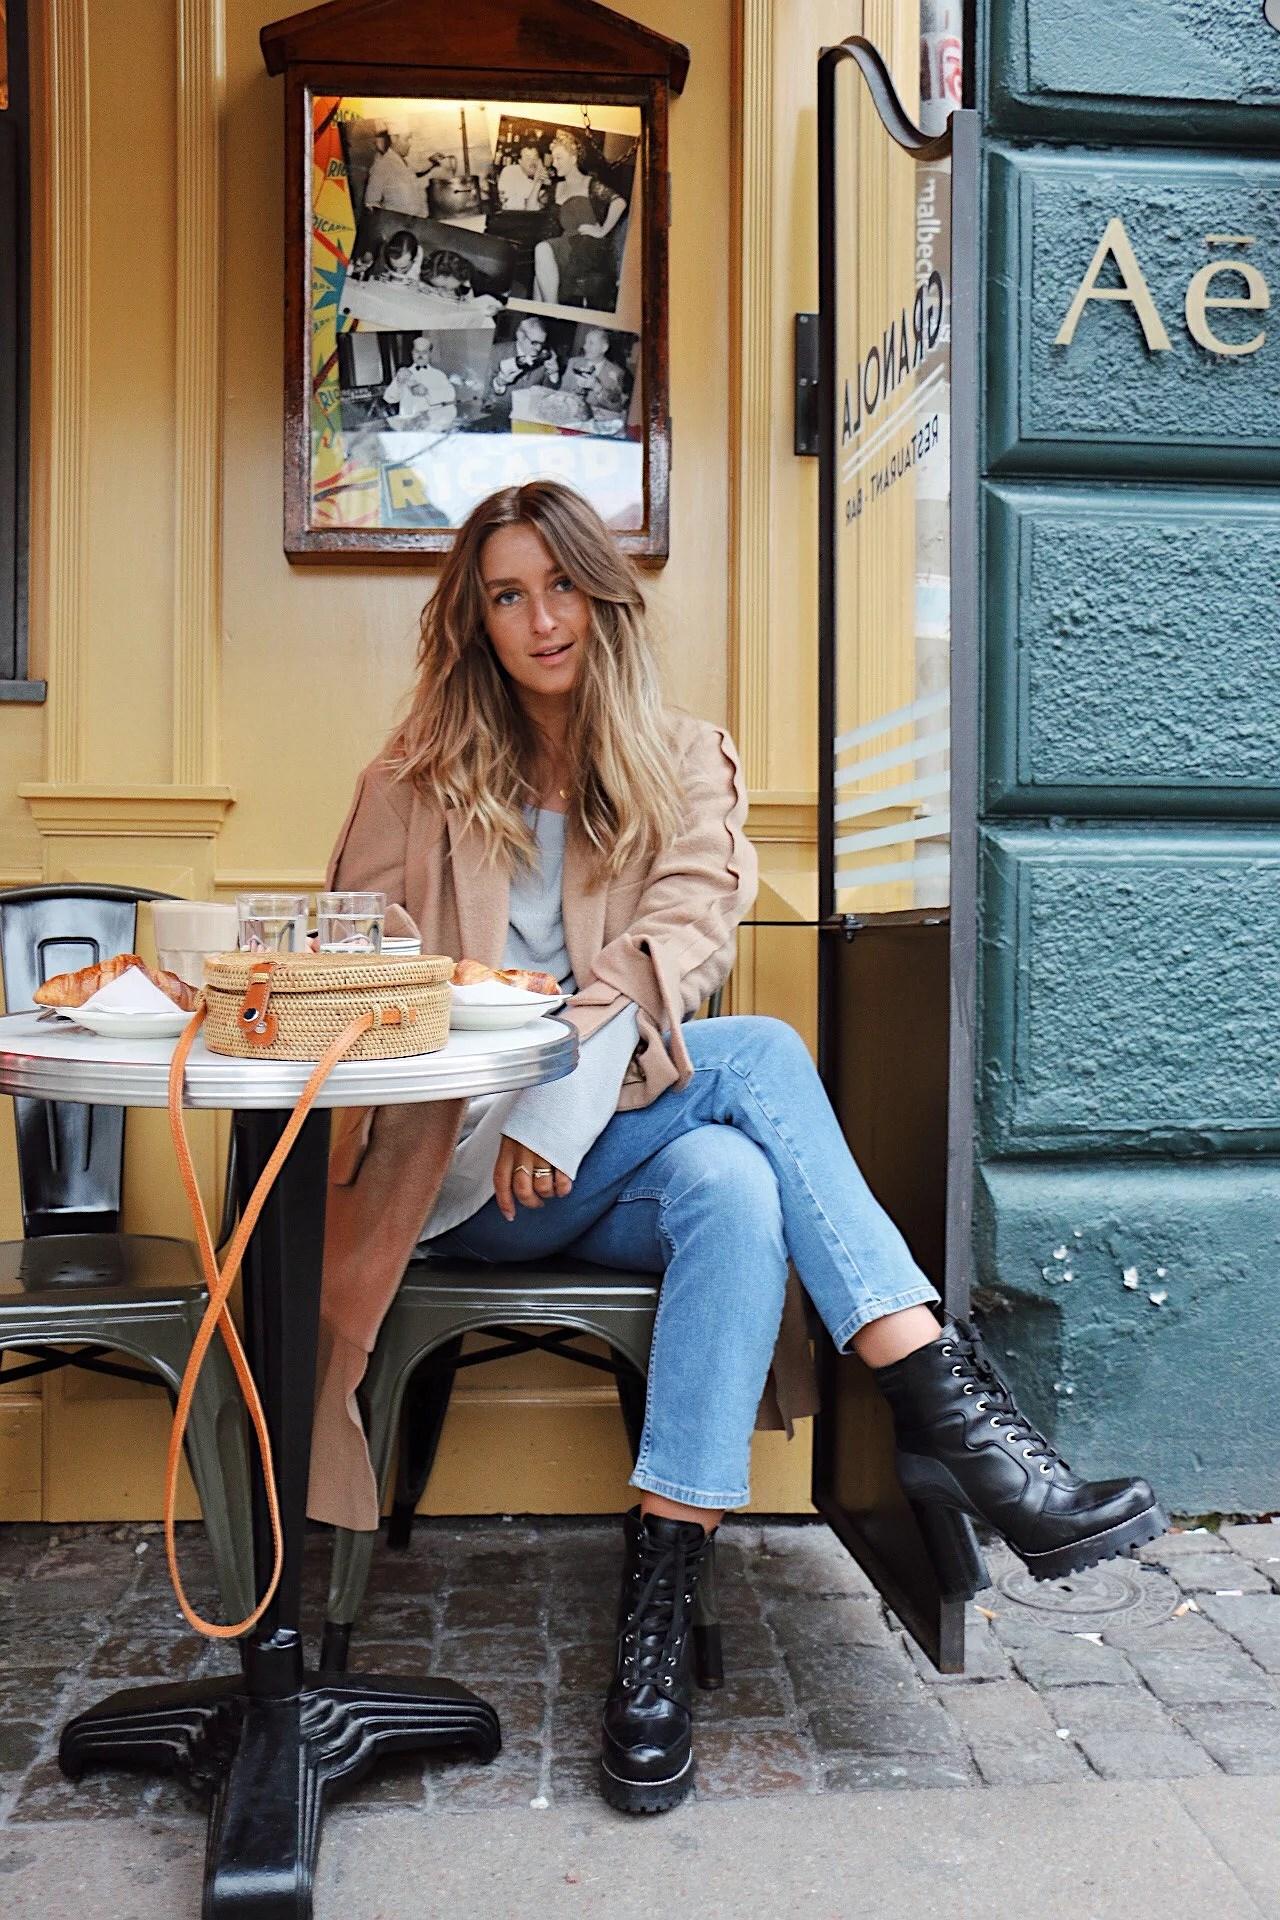 Insta tips & coffee spot!